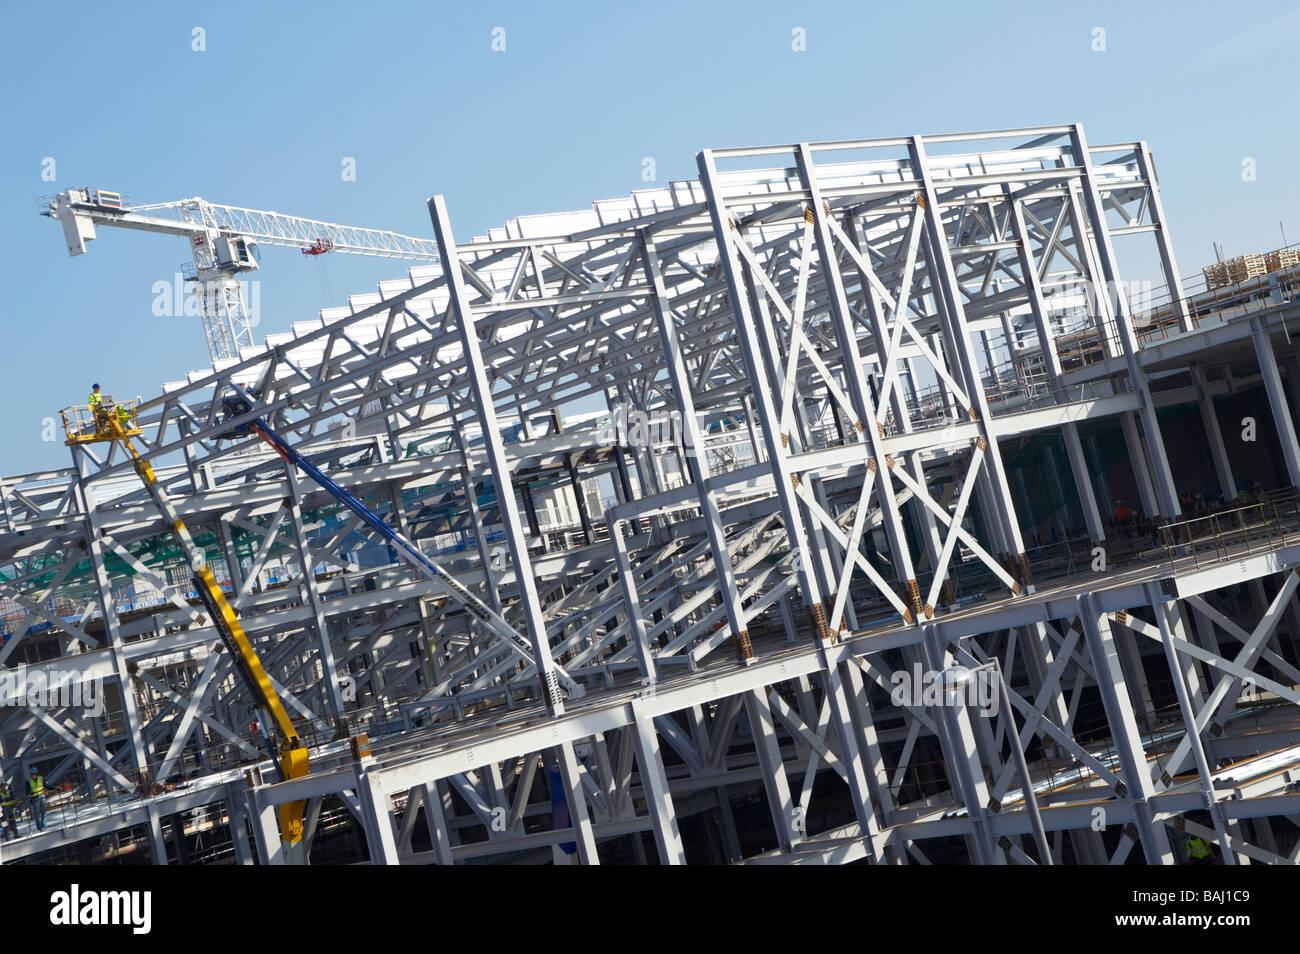 Stahlrahmenkonstruktion Stockfoto, Bild: 23753193 - Alamy